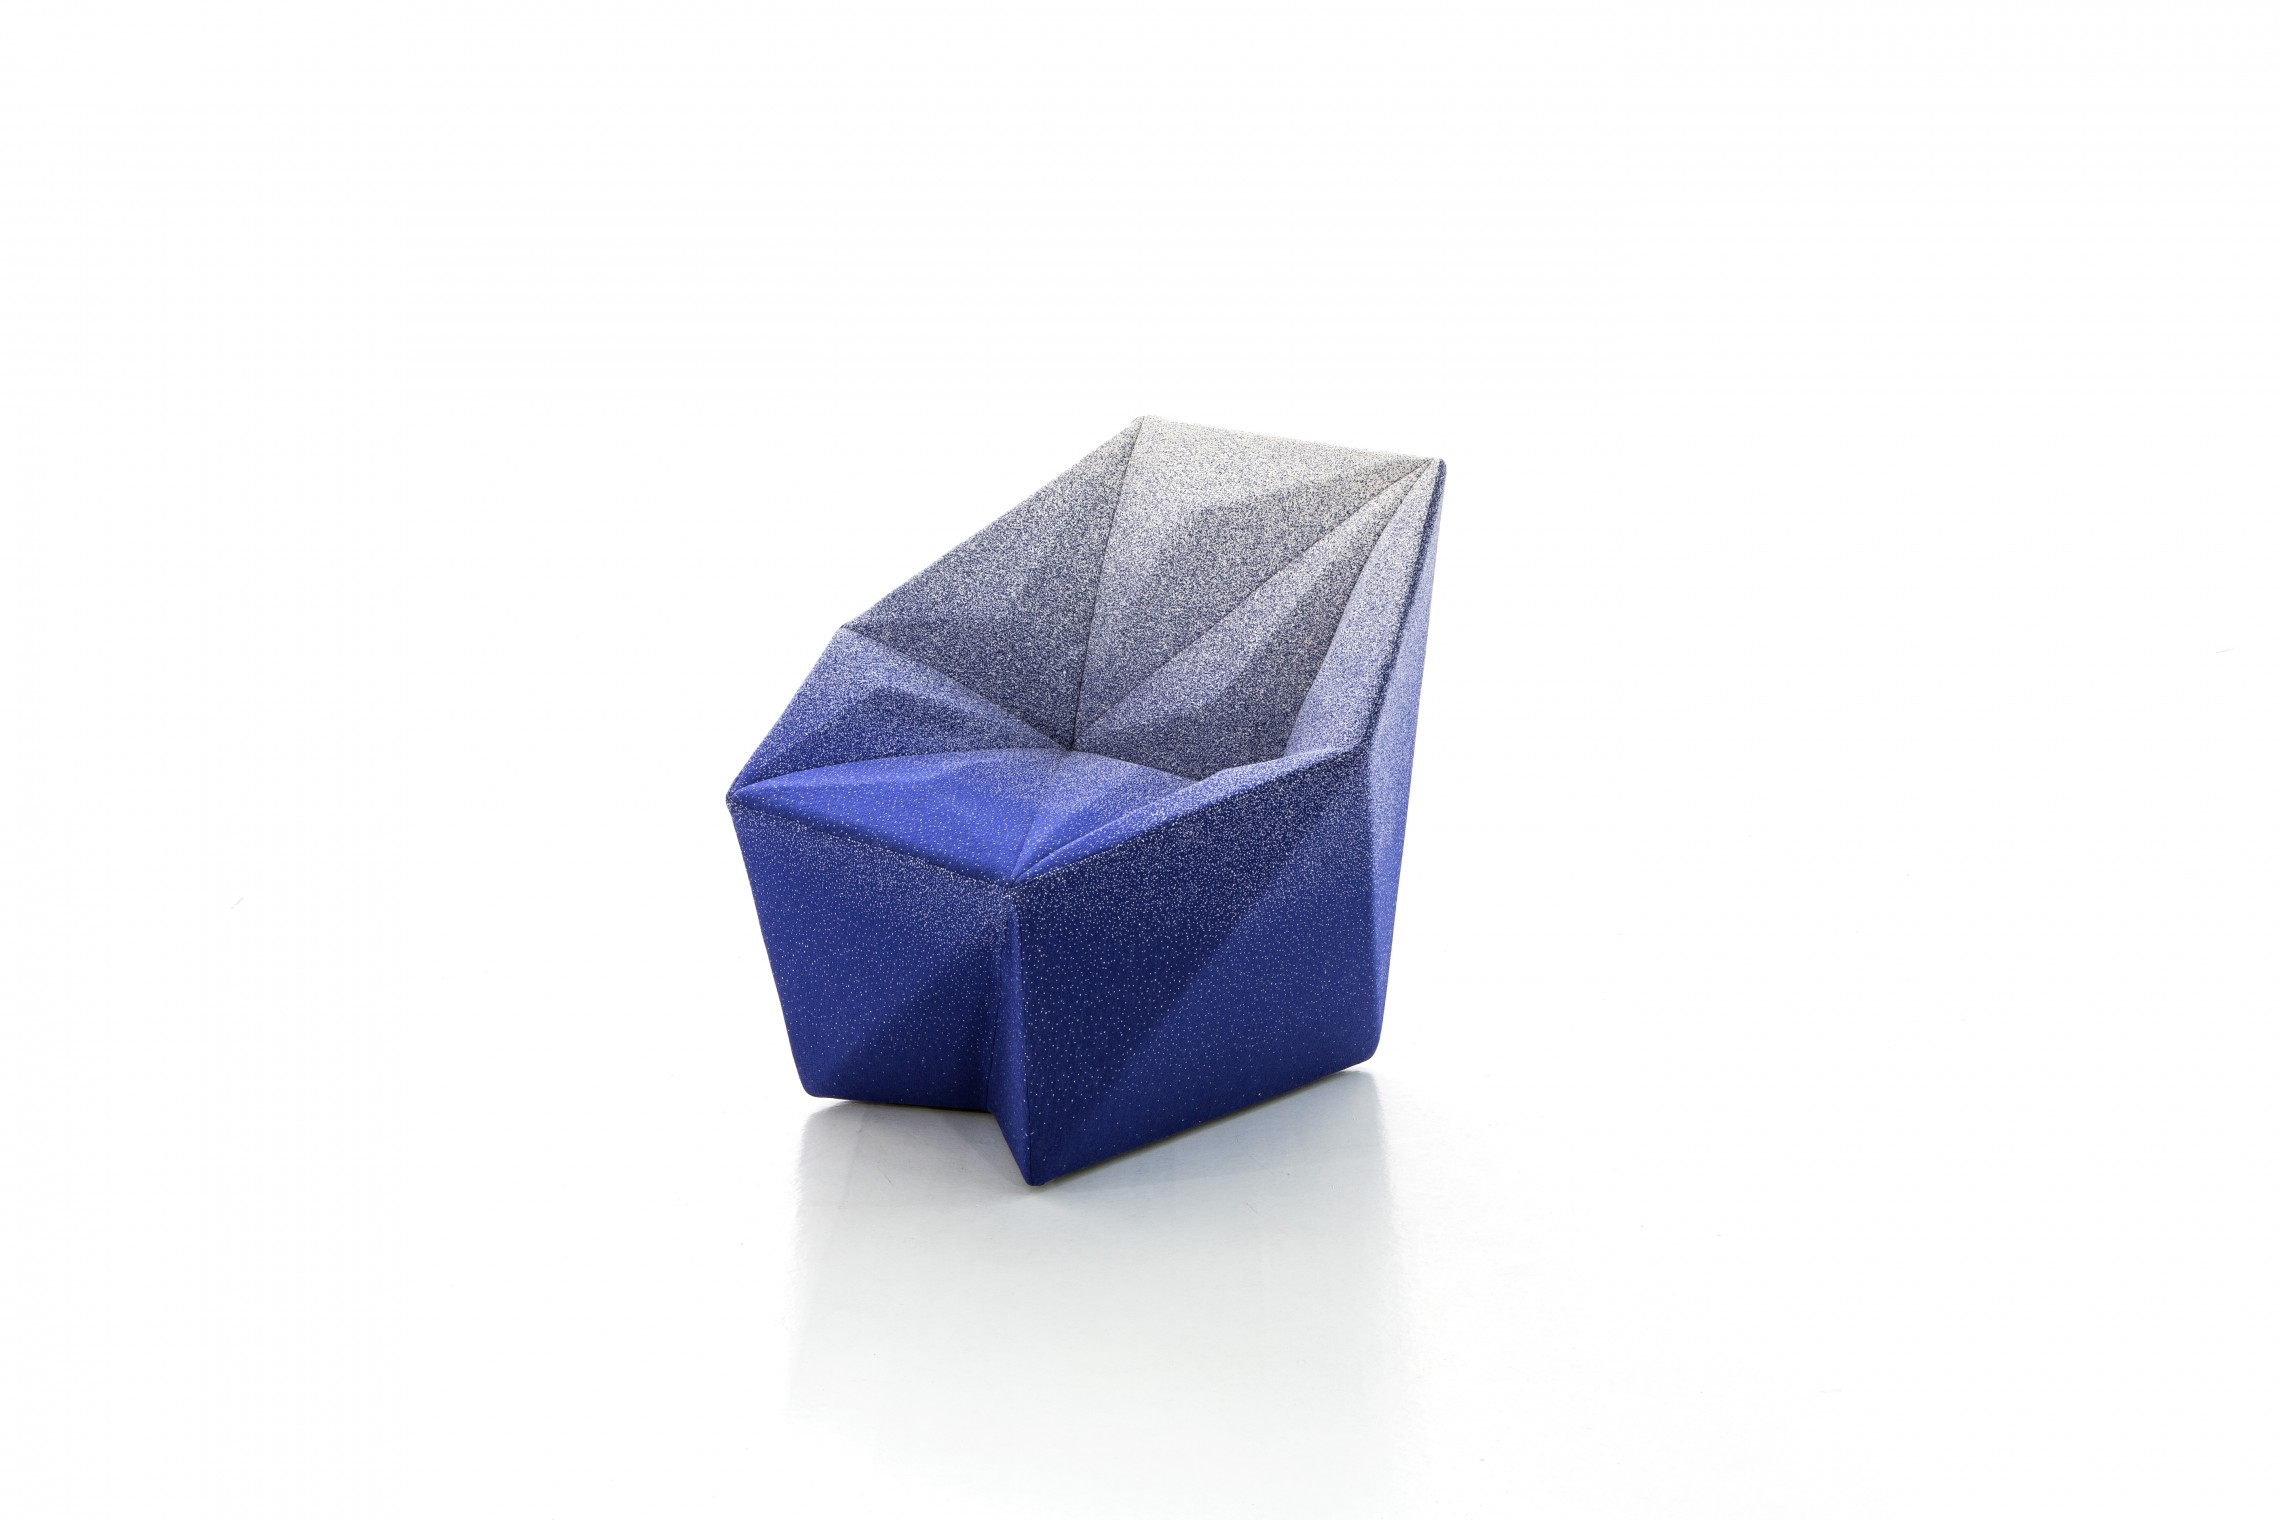 small scale sofa sofasystem fun gemma chair for moroso - libeskind